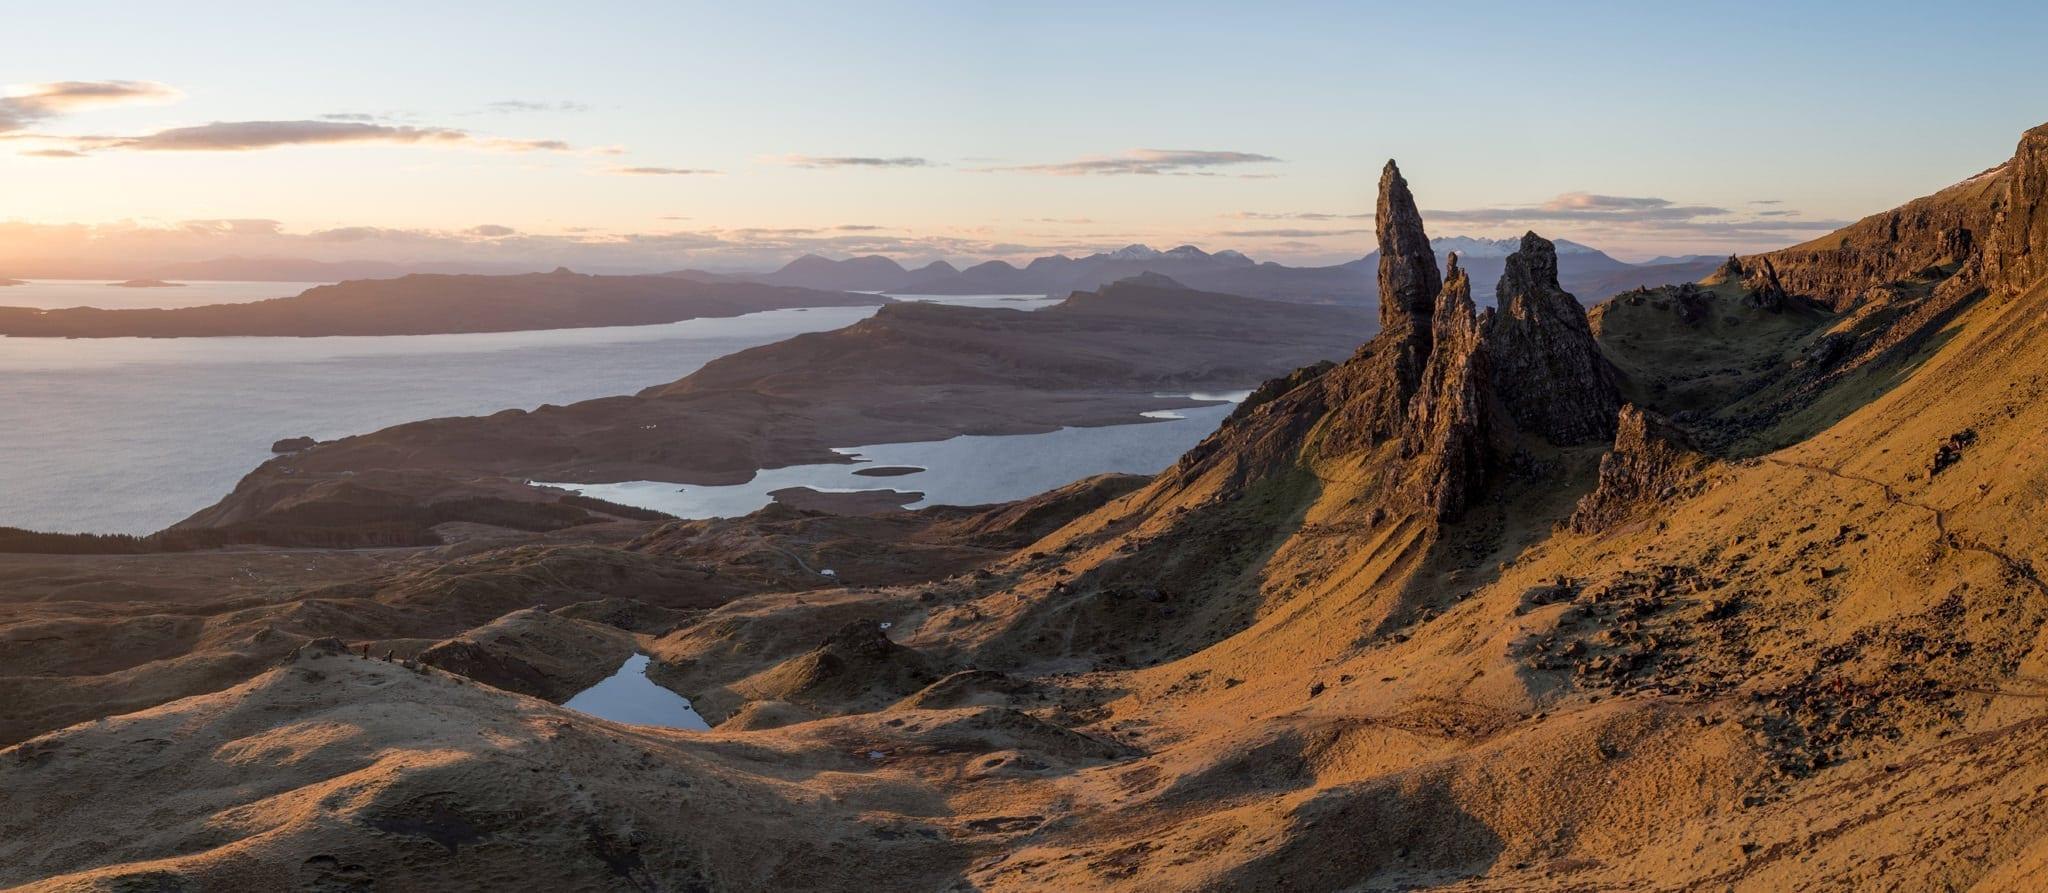 Old Man of Storr Sunrise - Scotland Photography